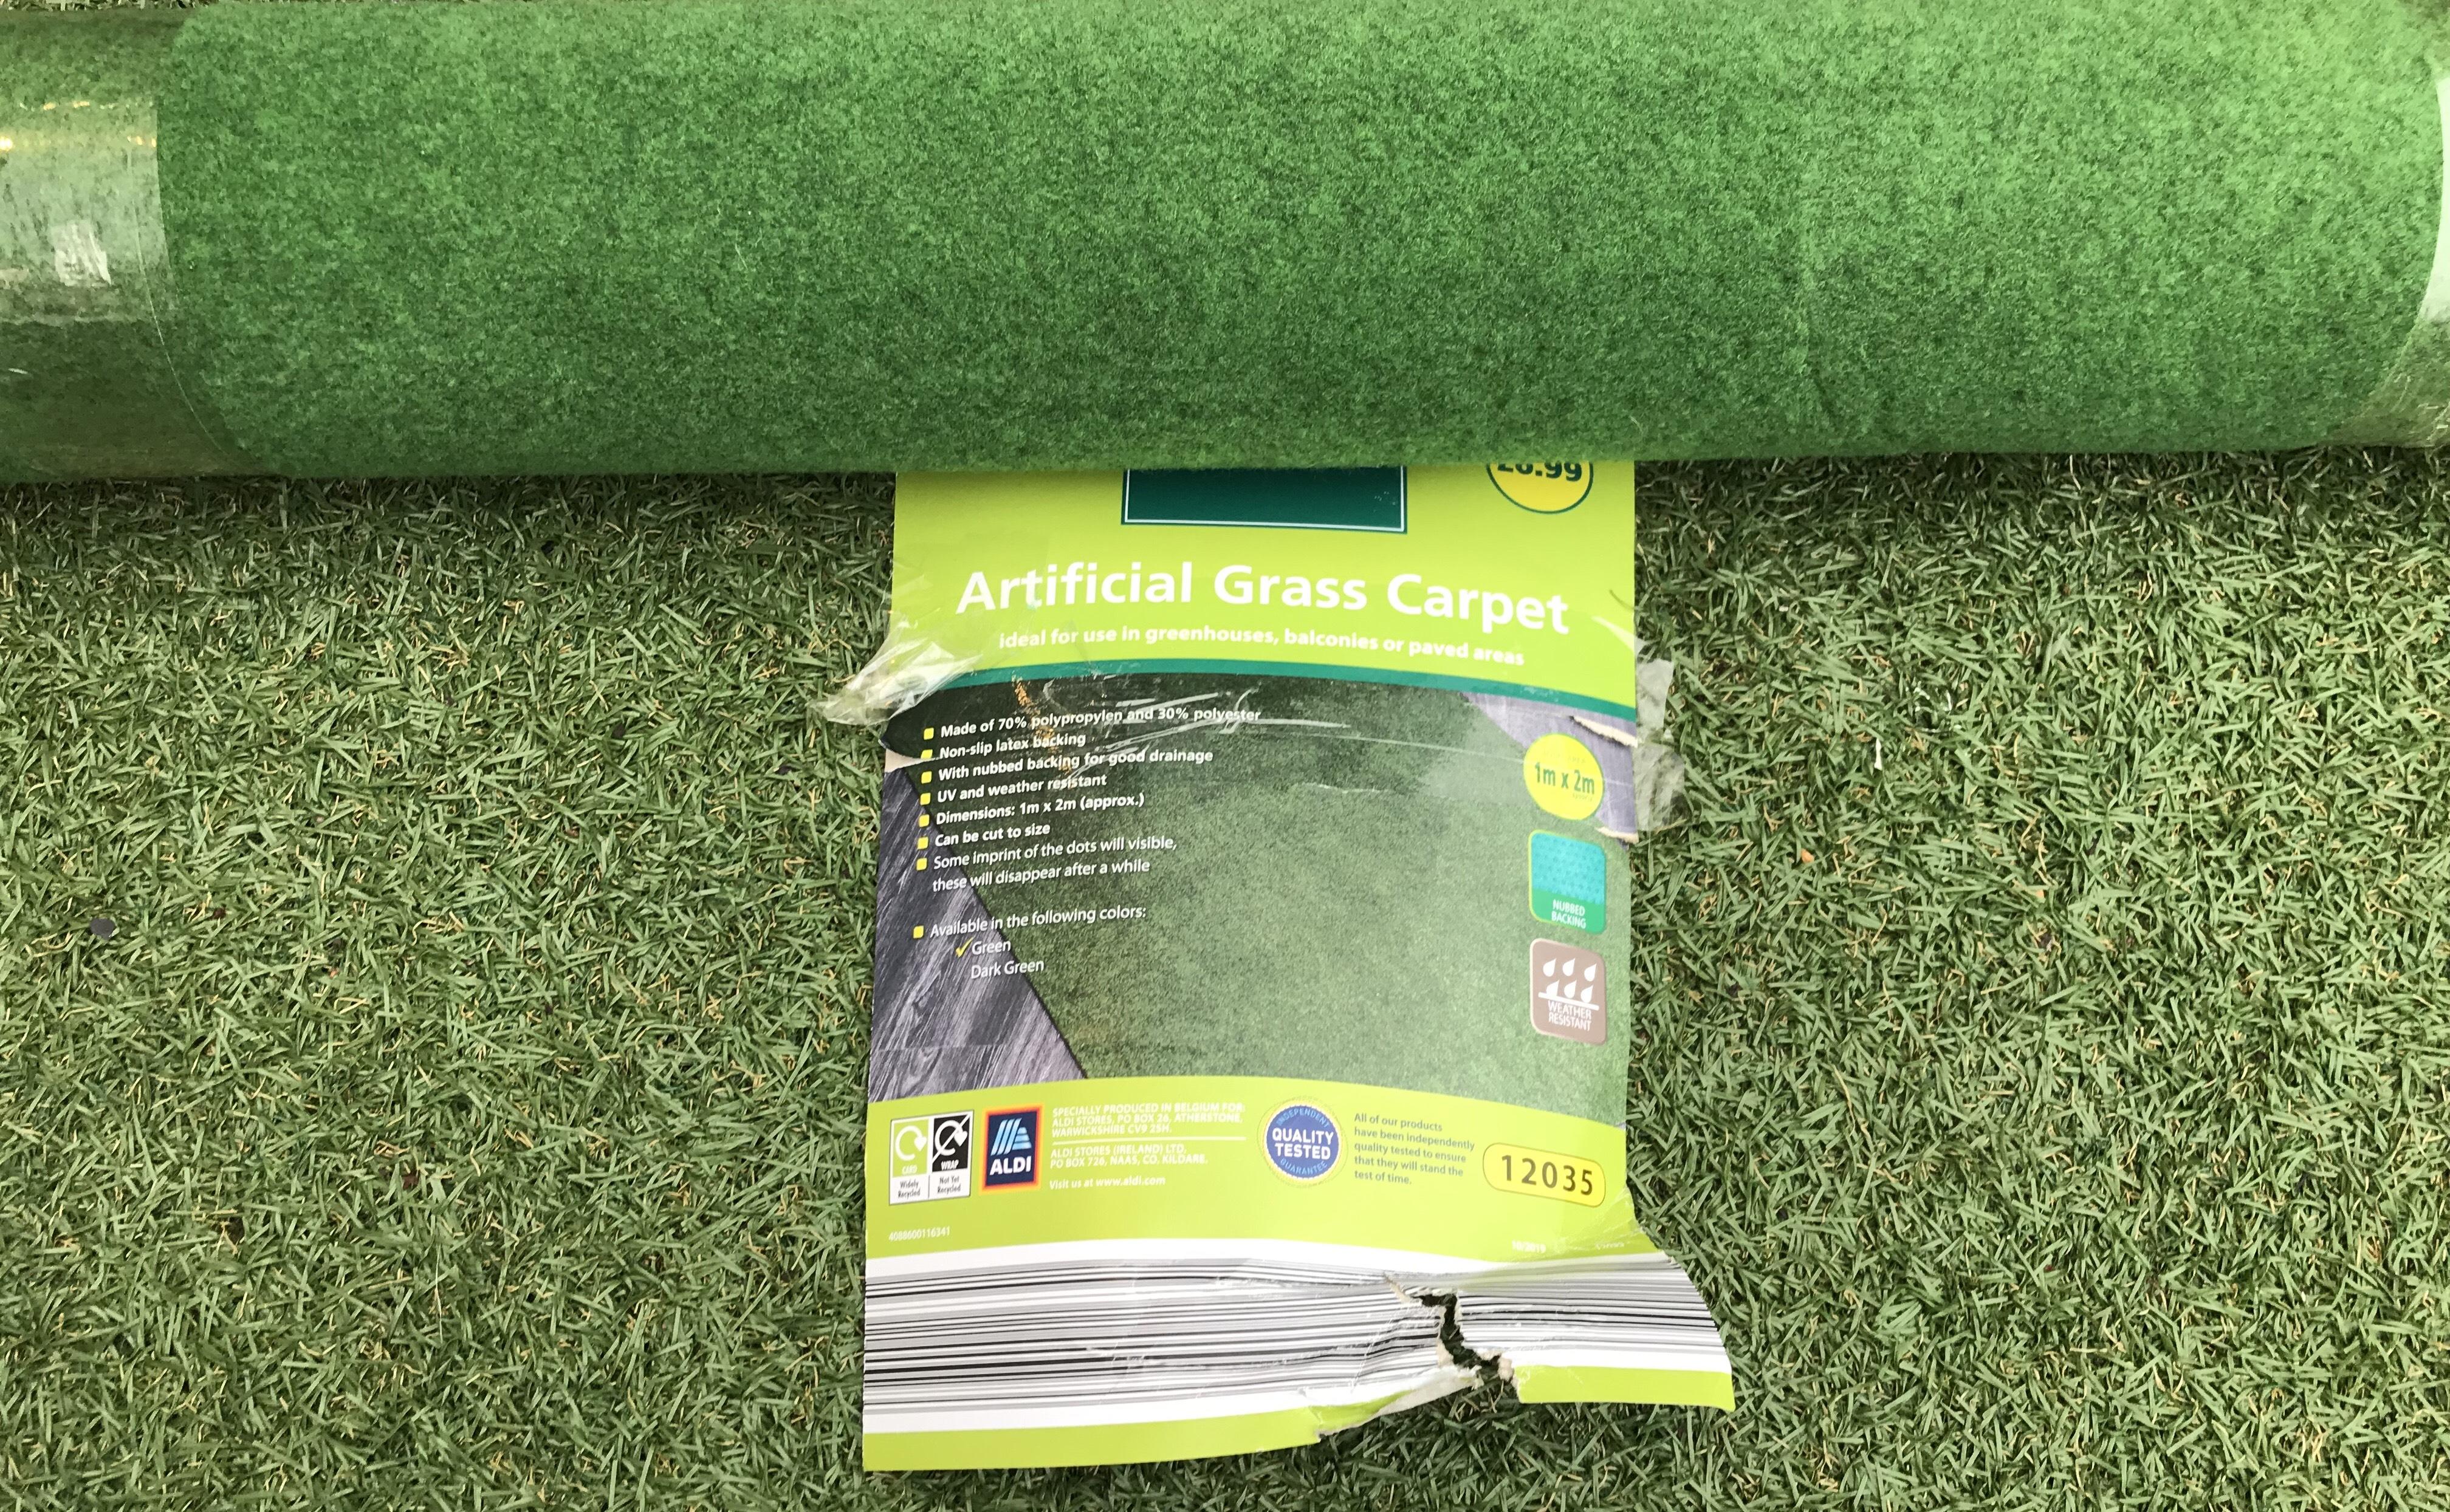 ARTIFICIAL GRASS CARPET ALDI £6.99 PER ROLL